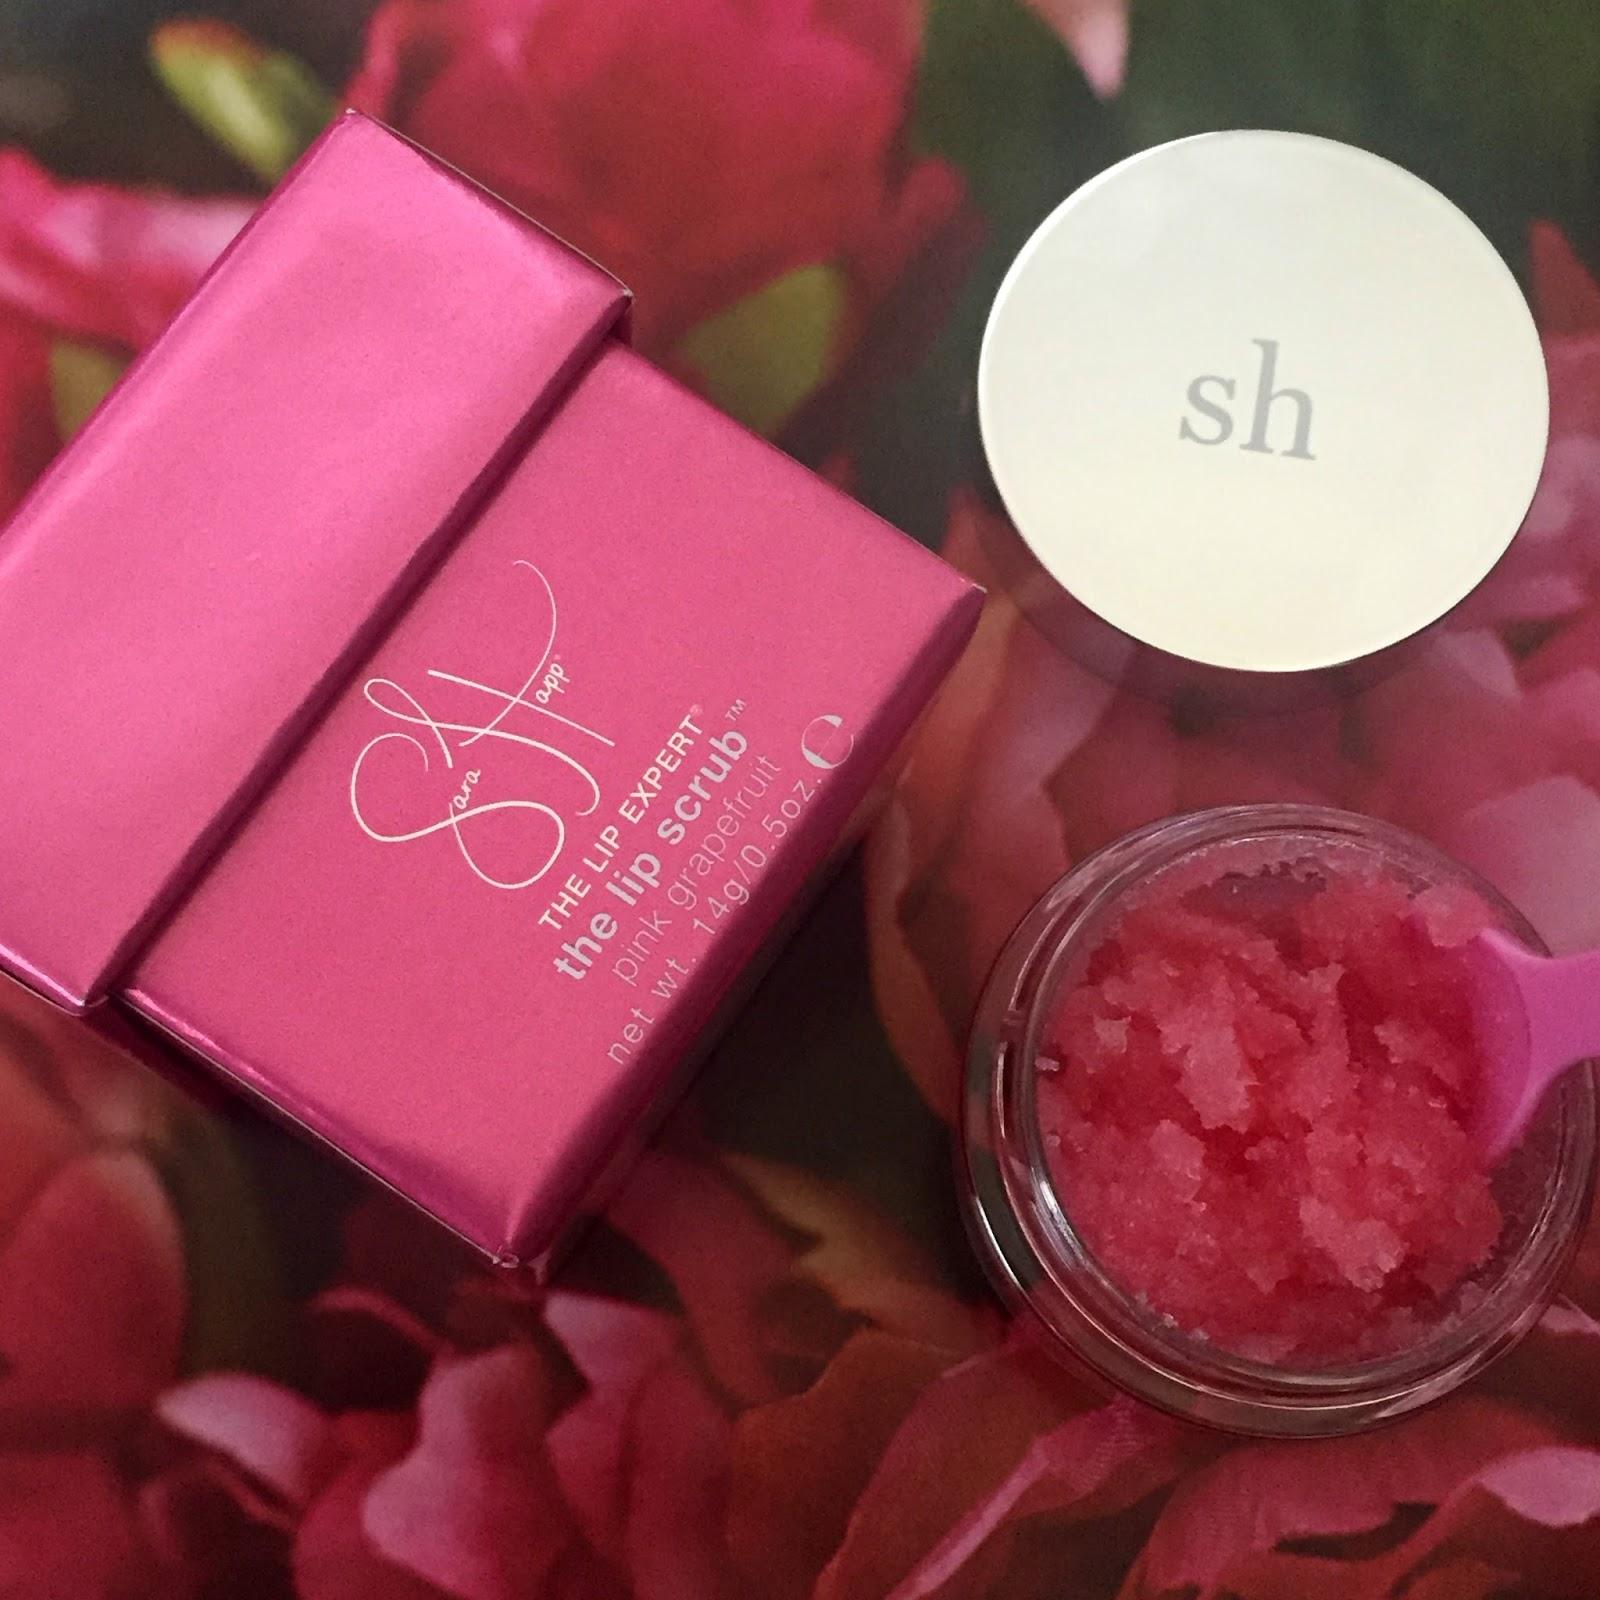 Sara Happ Pink Grapefruit Lip Scrub Review | A Very Sweet Blog